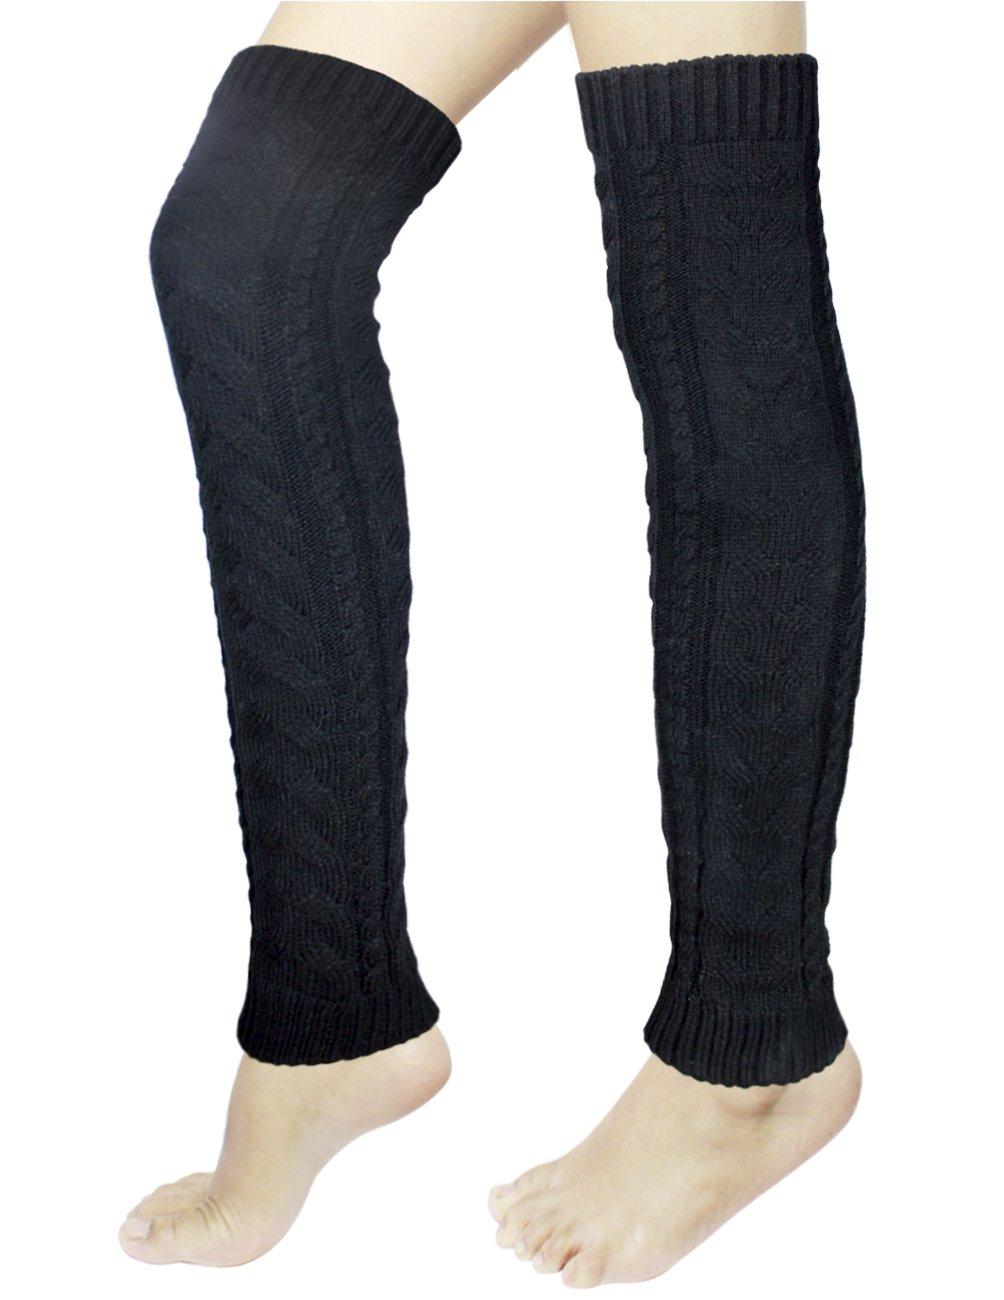 Dahlia Women's Long Cable Leg Warmers - Black